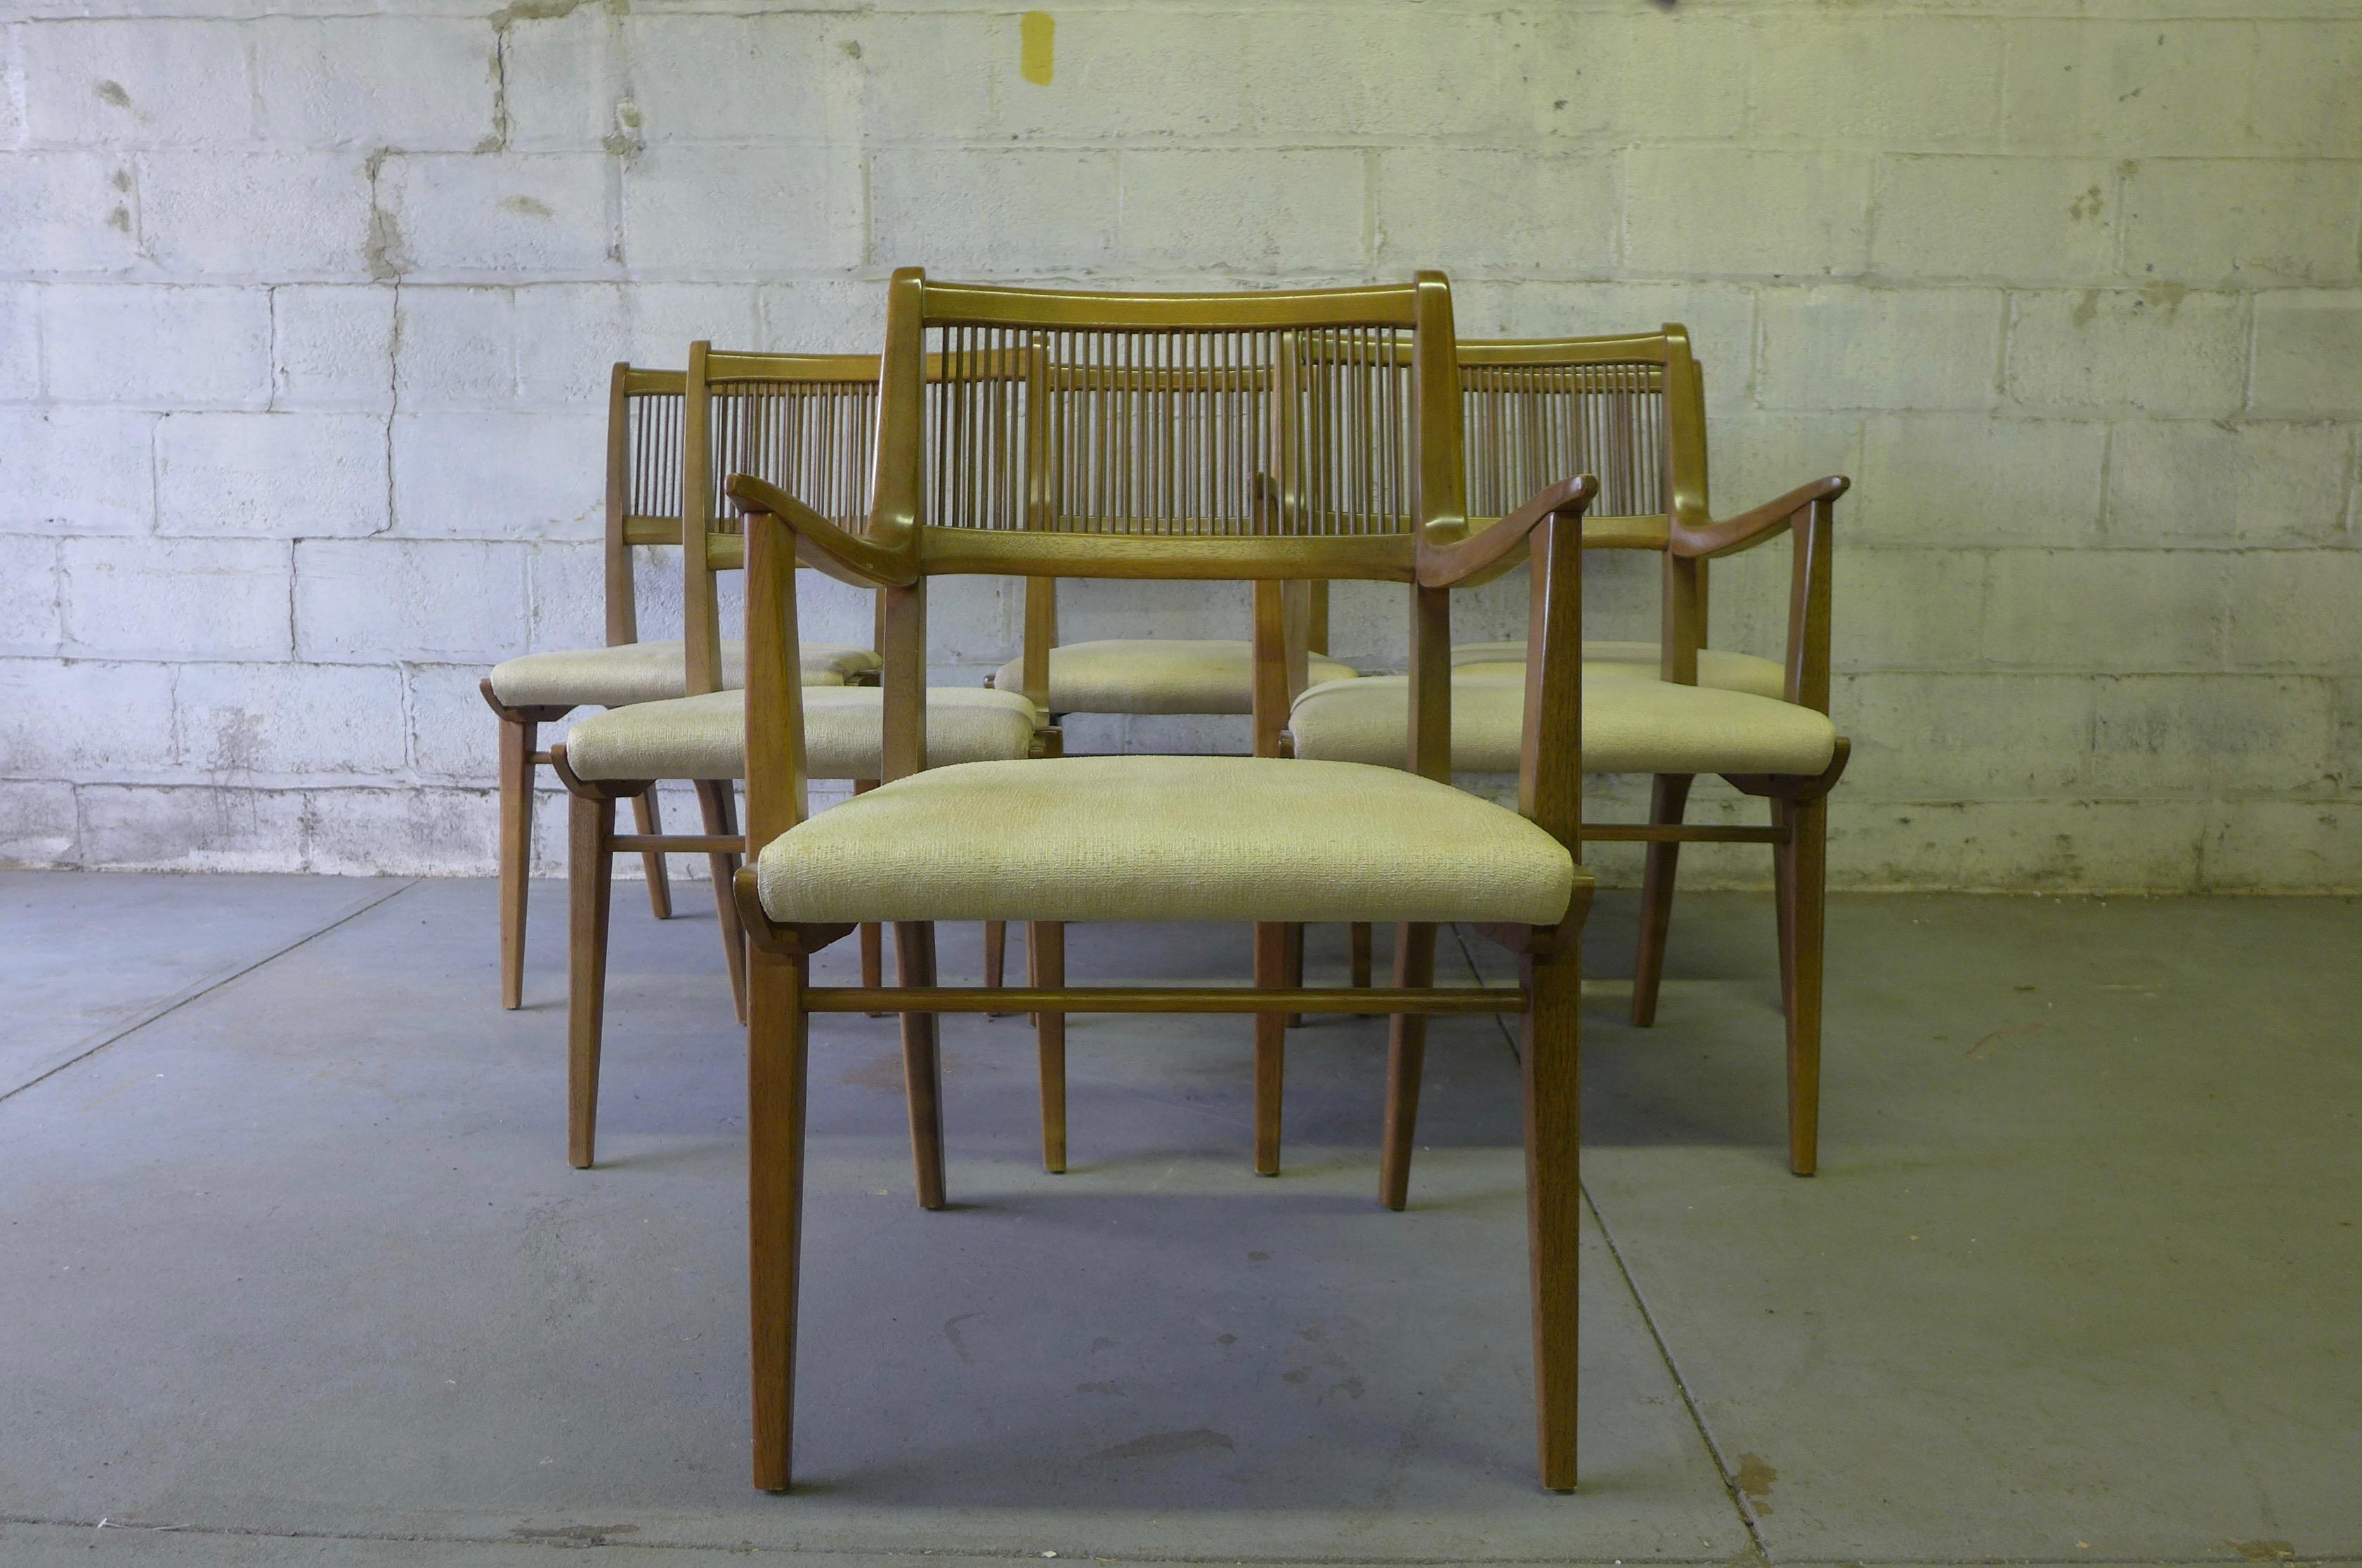 Drexel Mid Century Modern Dining Chairs By John Van Koert, Set Of 6   Image